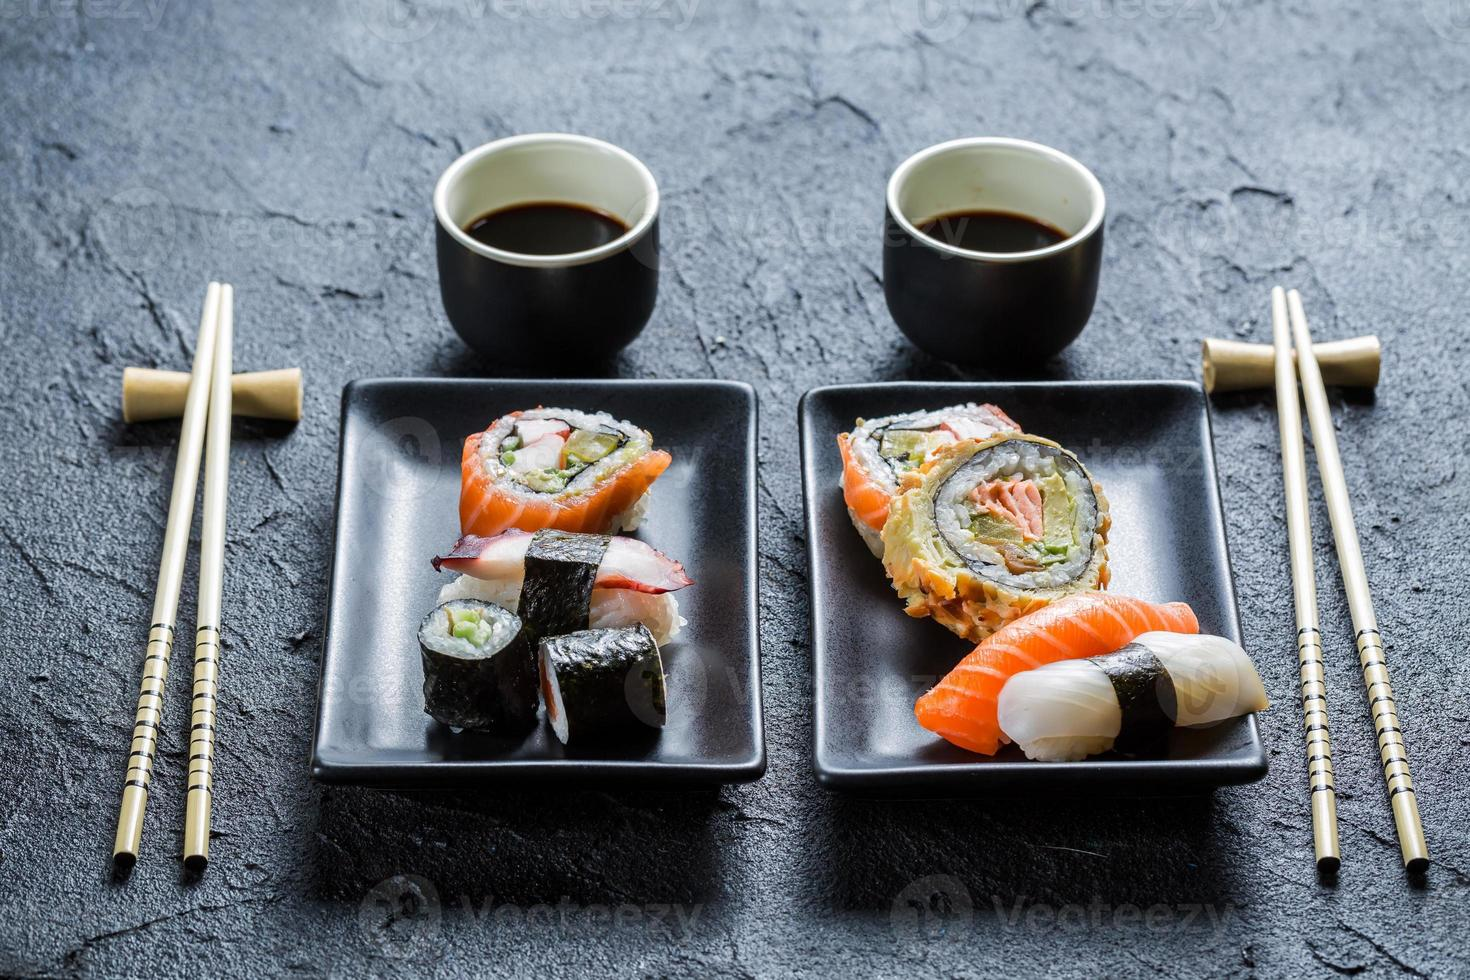 cena di sushi per due persone foto